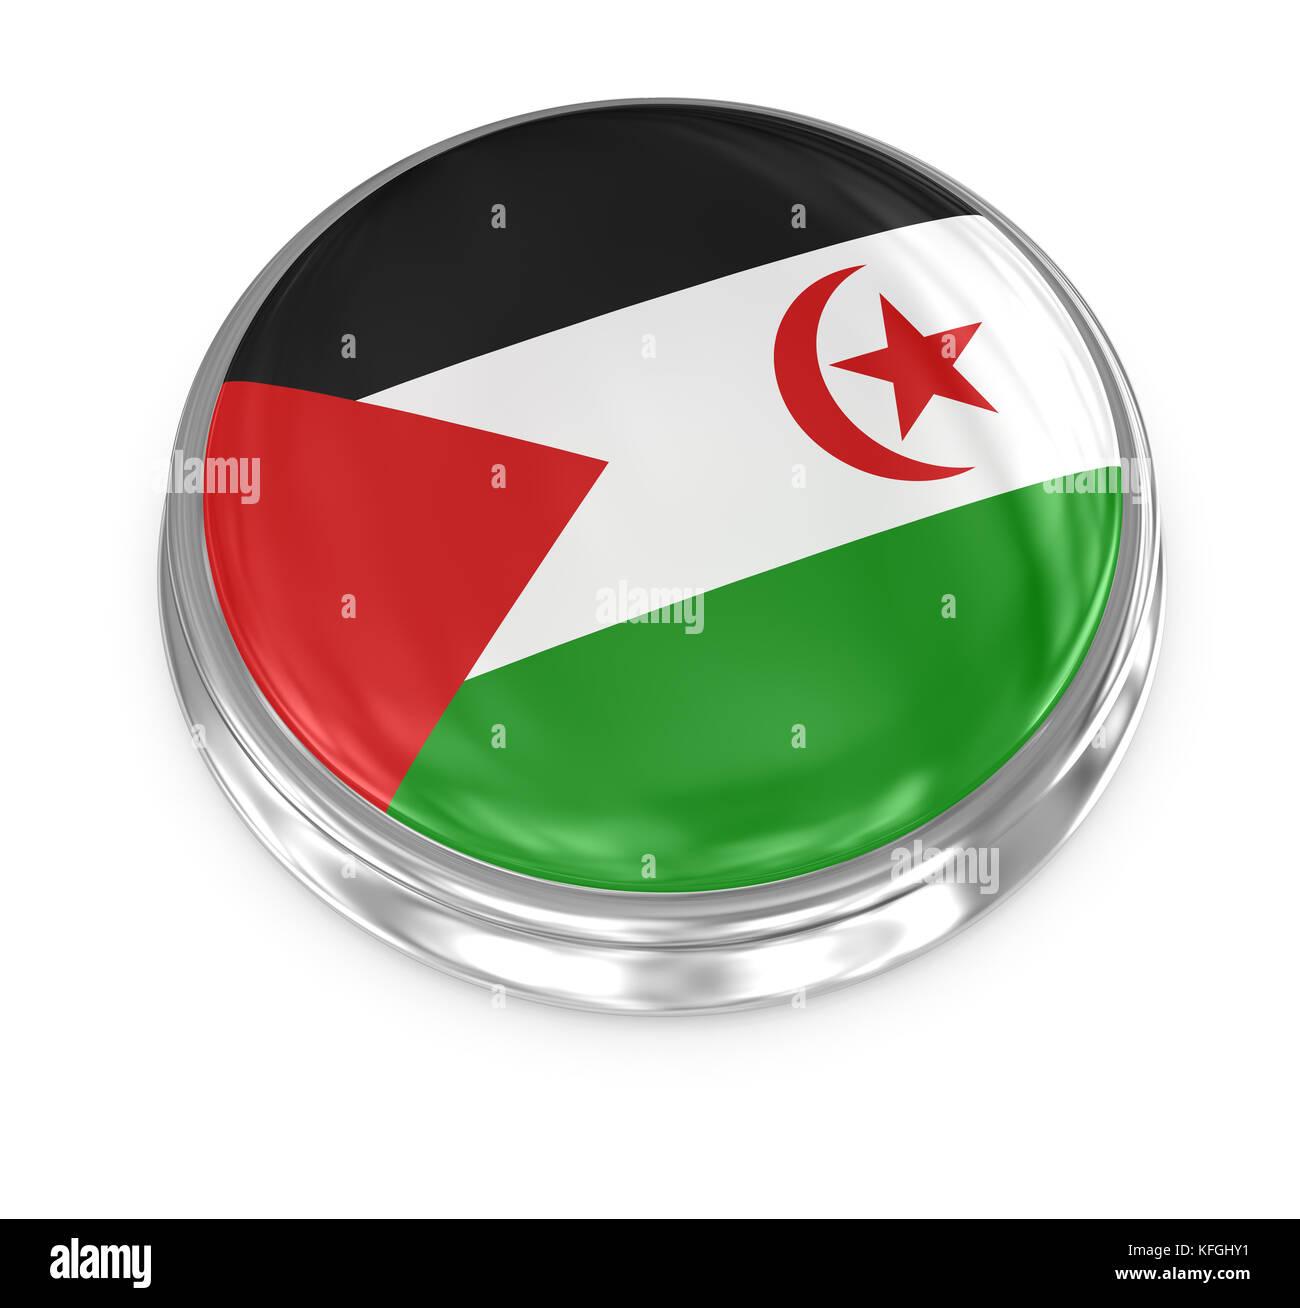 Sahrawi Arab Democratic Republic badge, computer generated image. - Stock Image